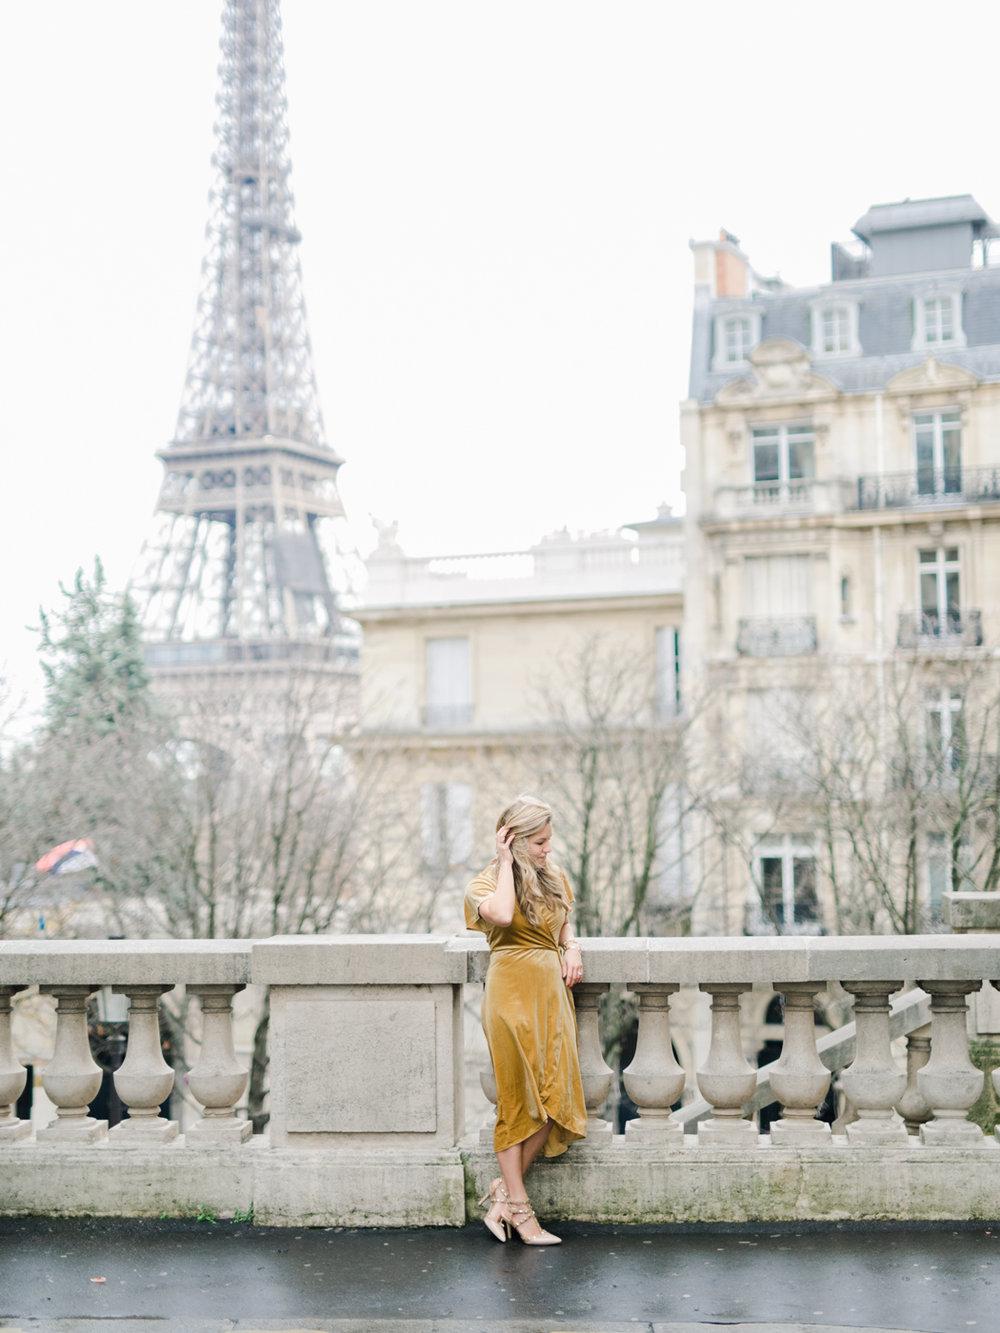 Parisian_Love_Shoot_Wedding_Photographer_Paris_Eiffel_Tower-7.jpg